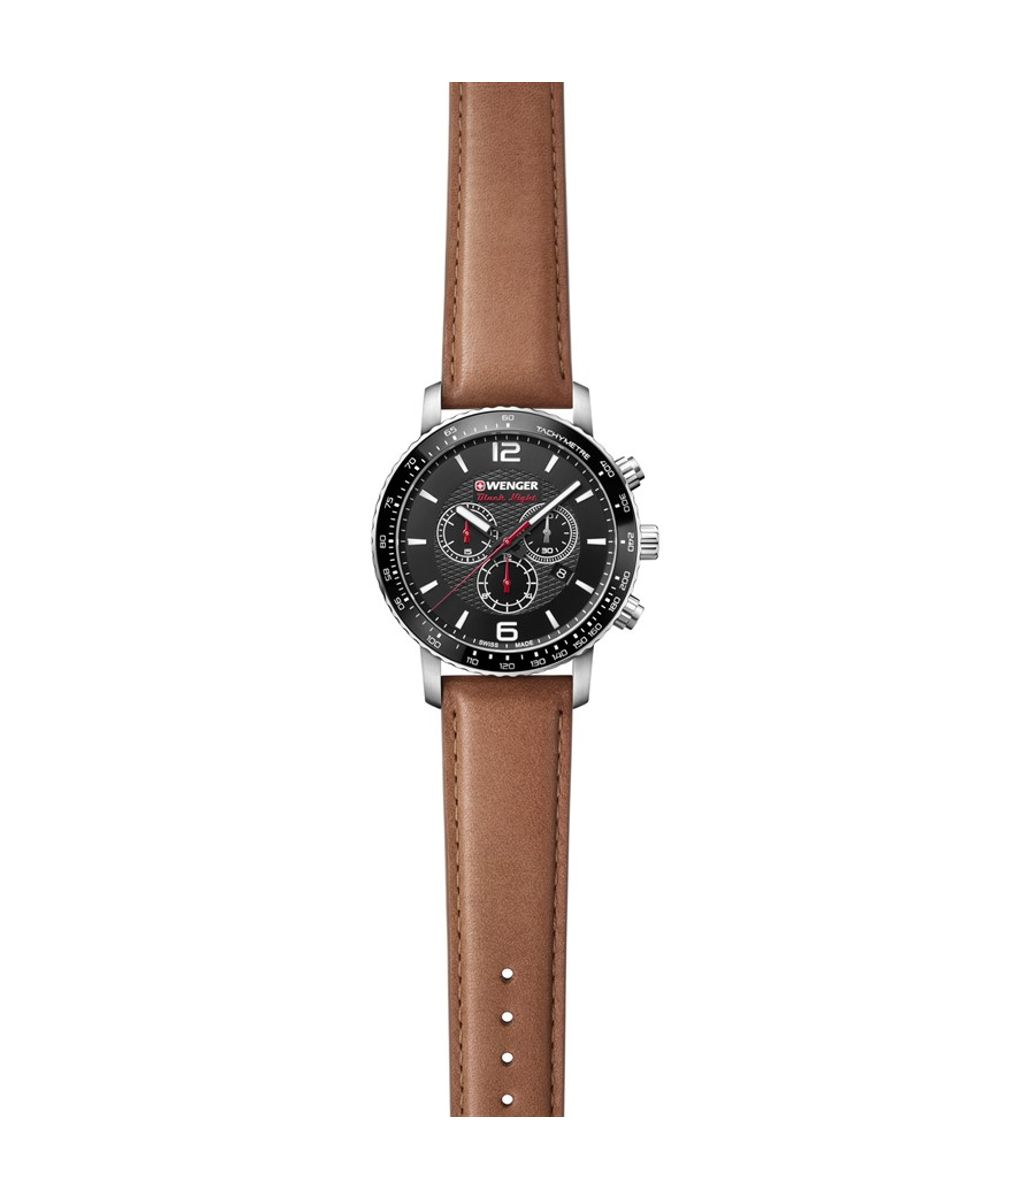 Relógio Masculino Wenger RoadSter Chrono Marrom